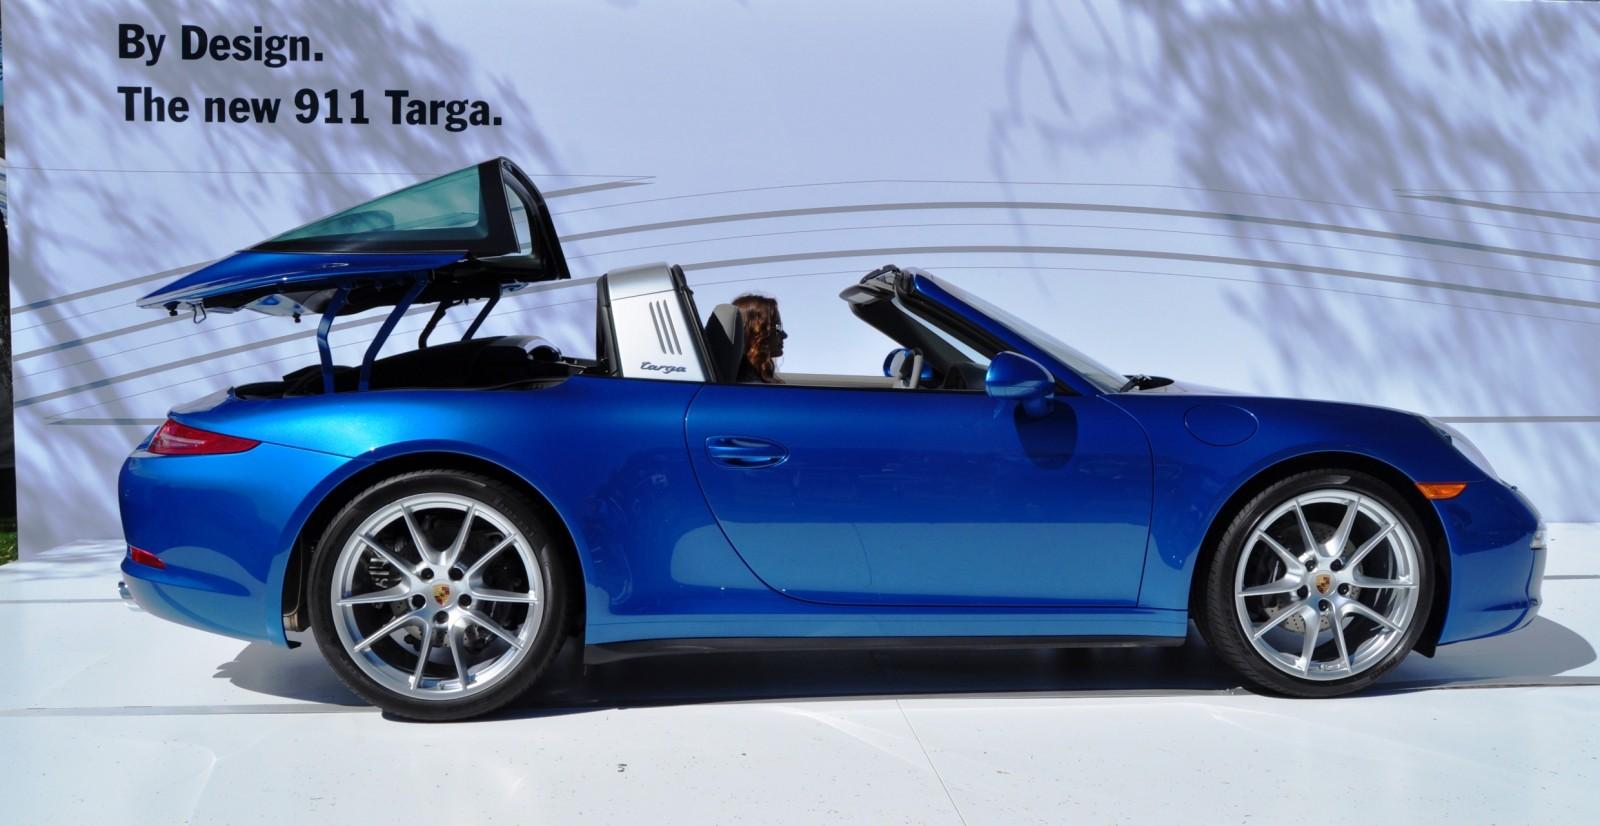 Excellent 2014 Porsche 911 Targa 4  Animated Roof Sequence  30 HighRes Photos